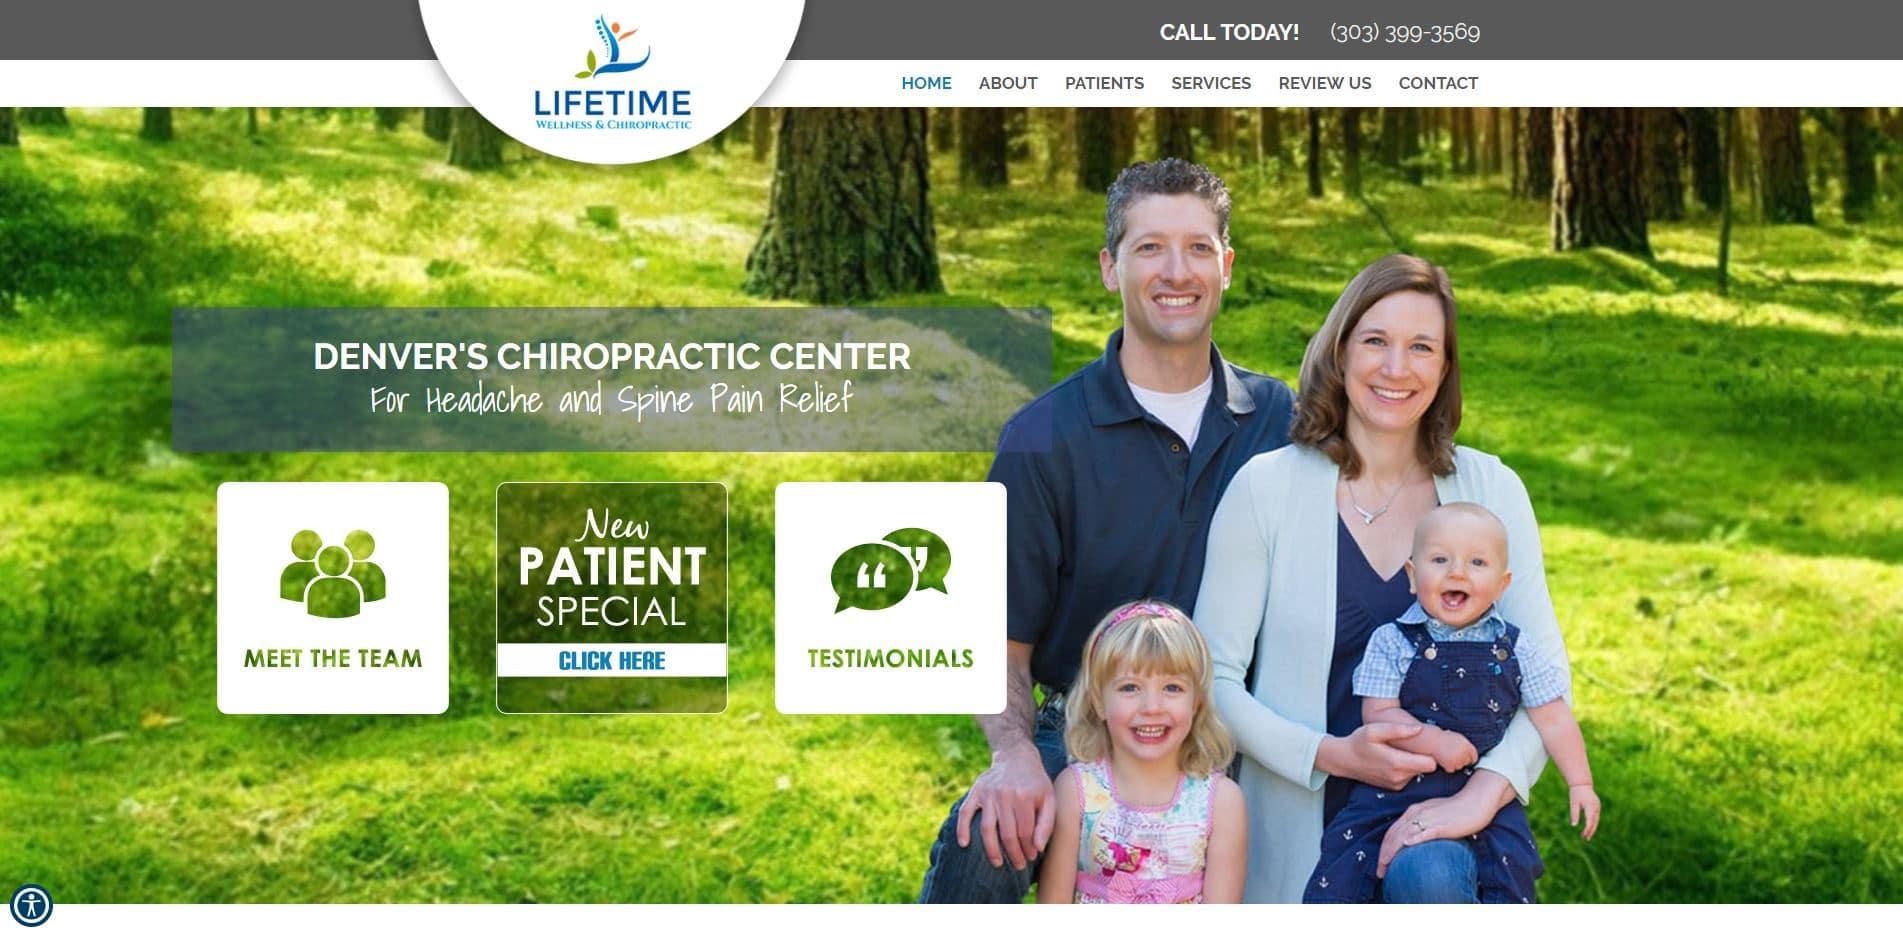 Chiropractor in Denver